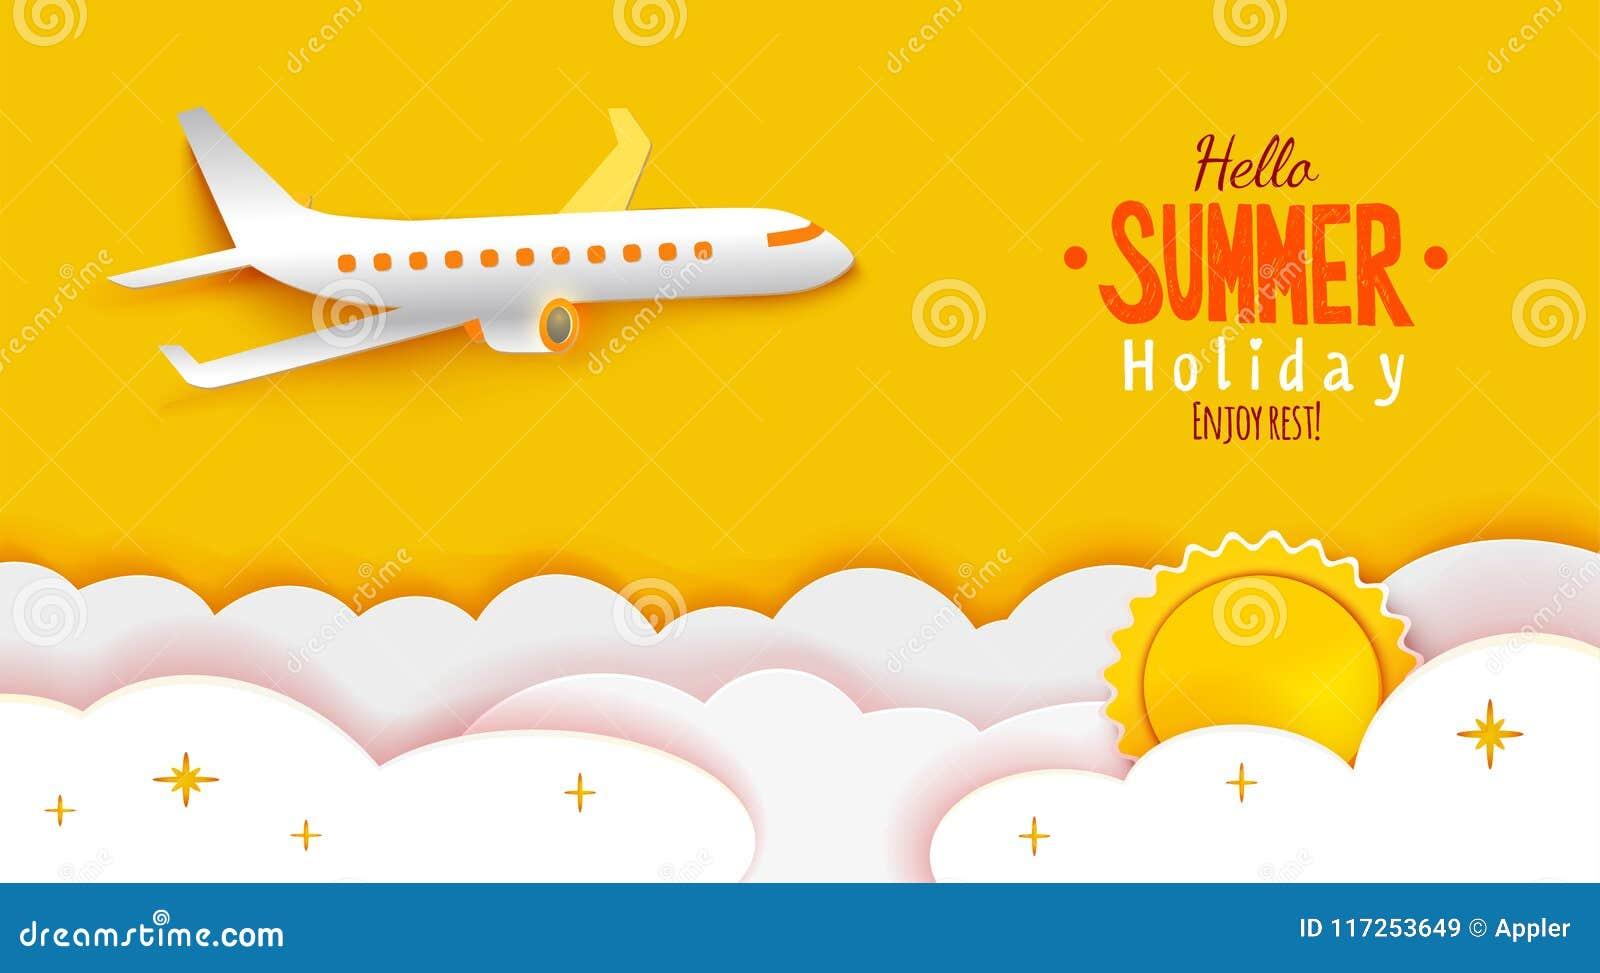 Enjoy summer holidays paper art stock vector illustration of flat download enjoy summer holidays paper art stock vector illustration of flat shadow 117253649 m4hsunfo